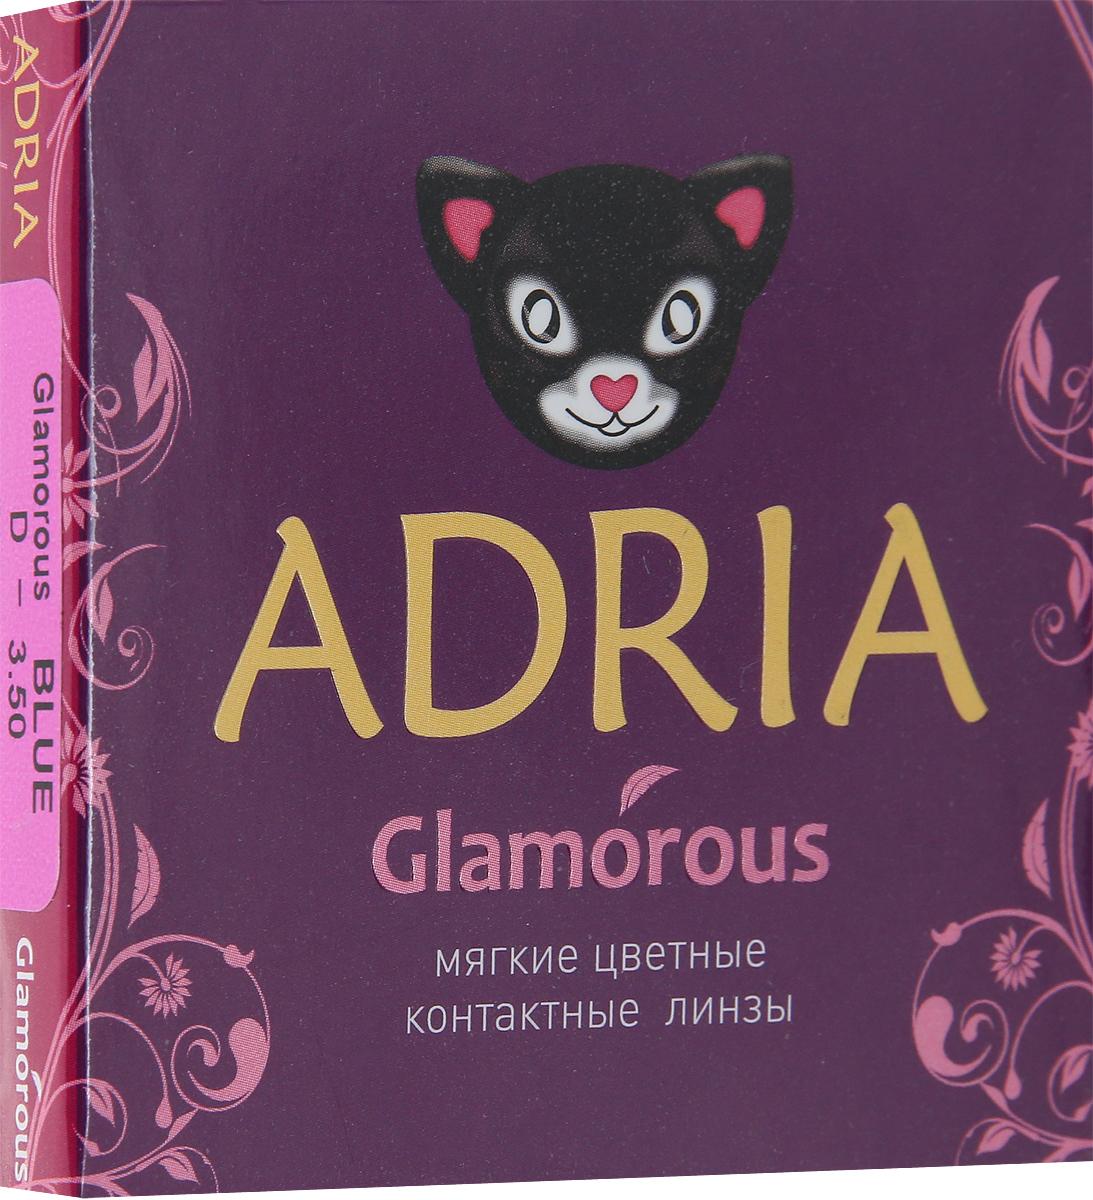 Adria Контактные линзы Glamorous color / 2 шт / -3.50 / 8.6 / 14.5 / Blue